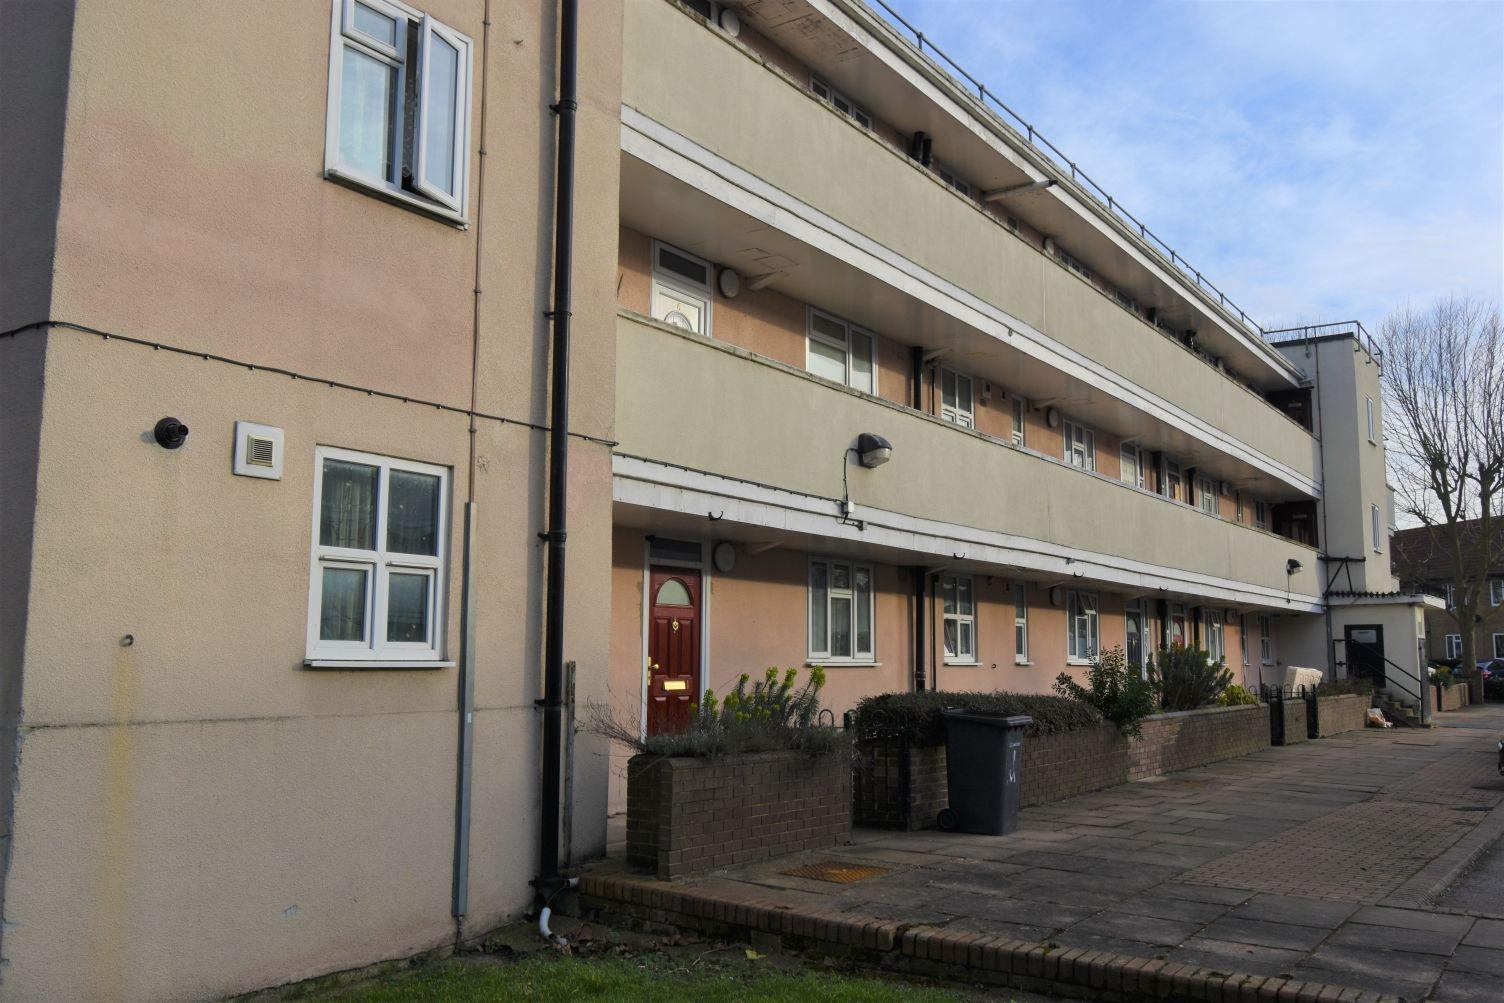 Property photo 1 of 5. External